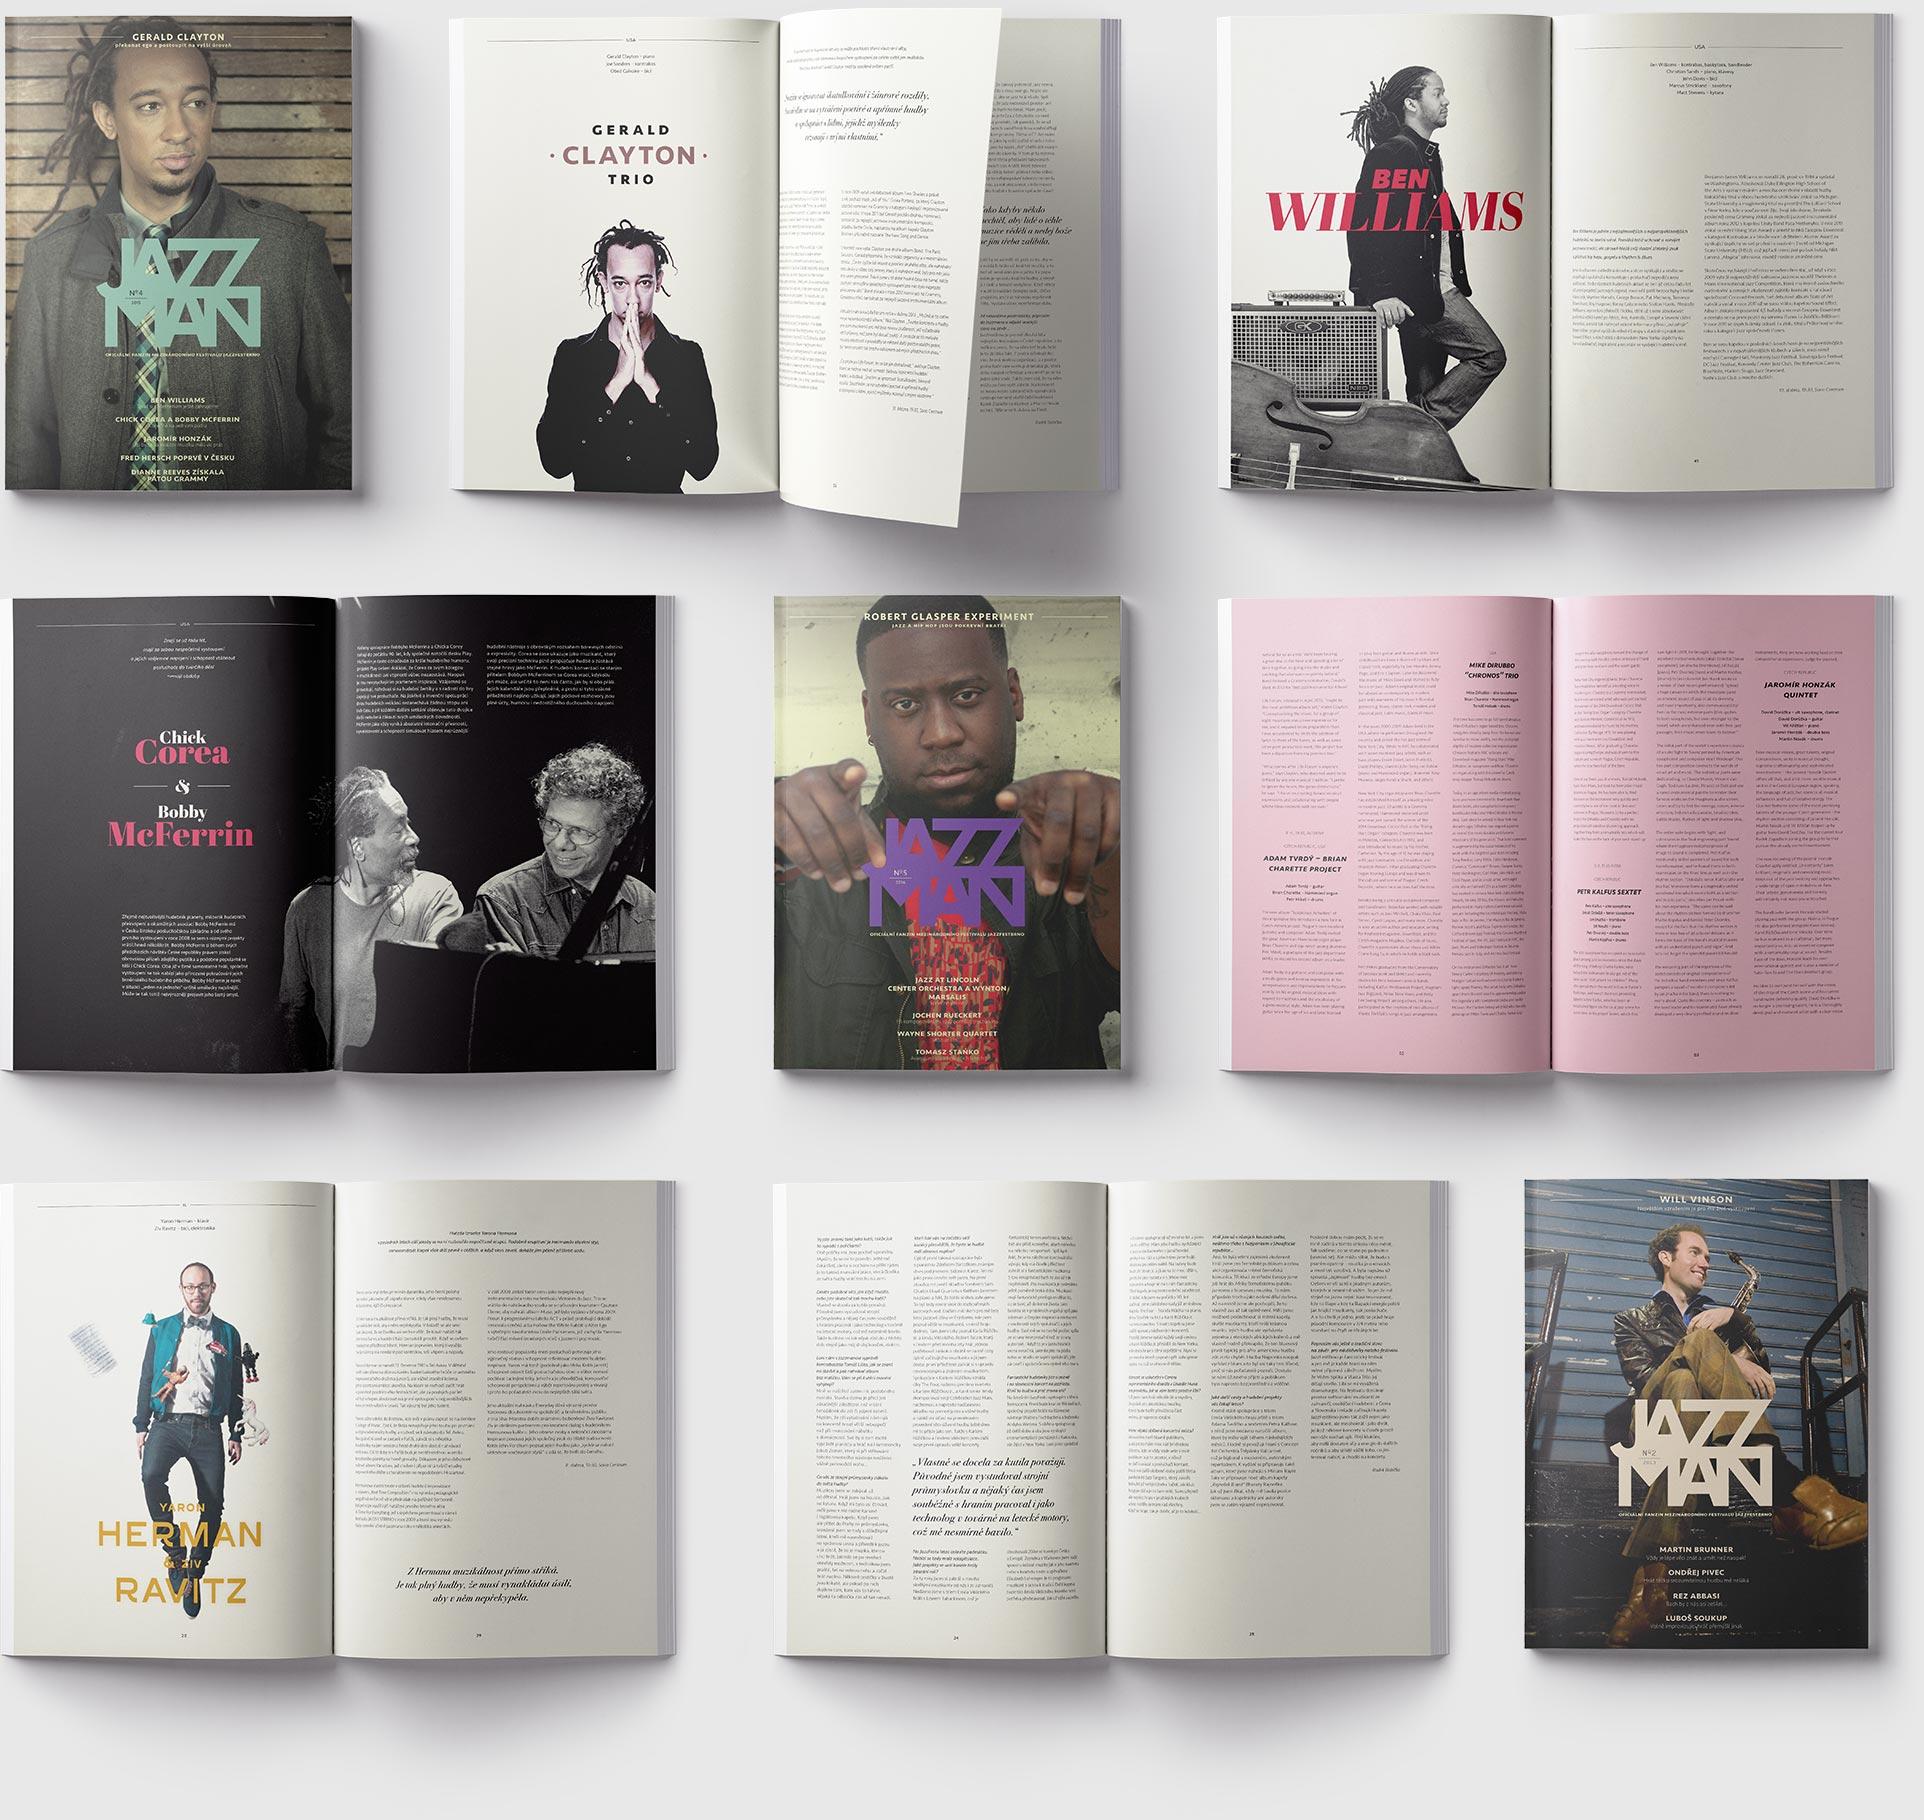 Festival Magazine – Jazzman